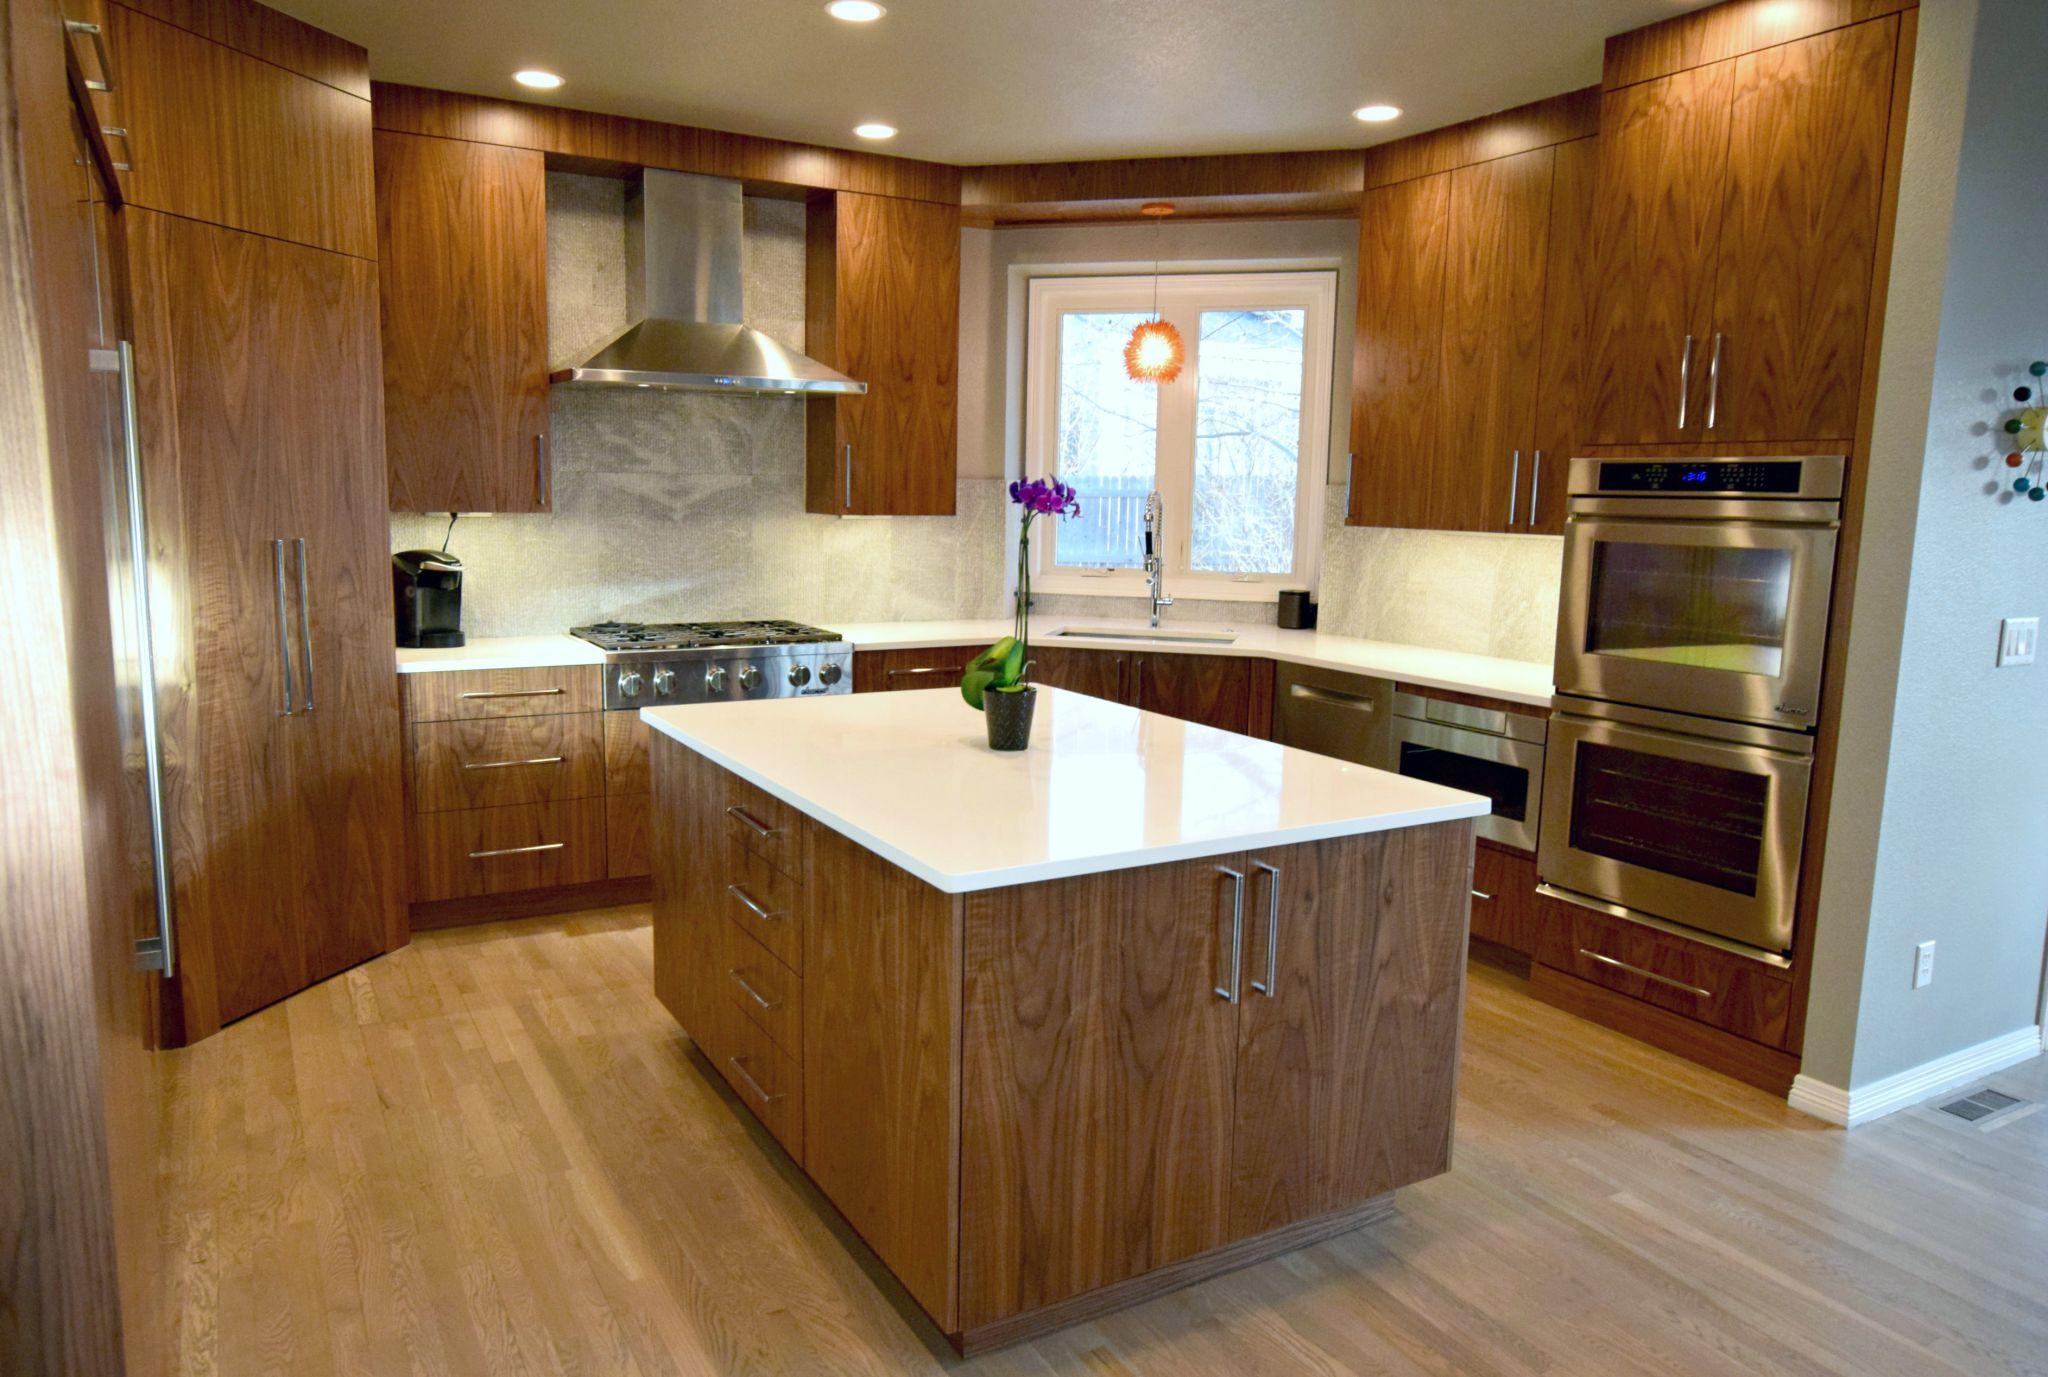 BKC Kitchen and Bath  Kitchen Cabinets Denver